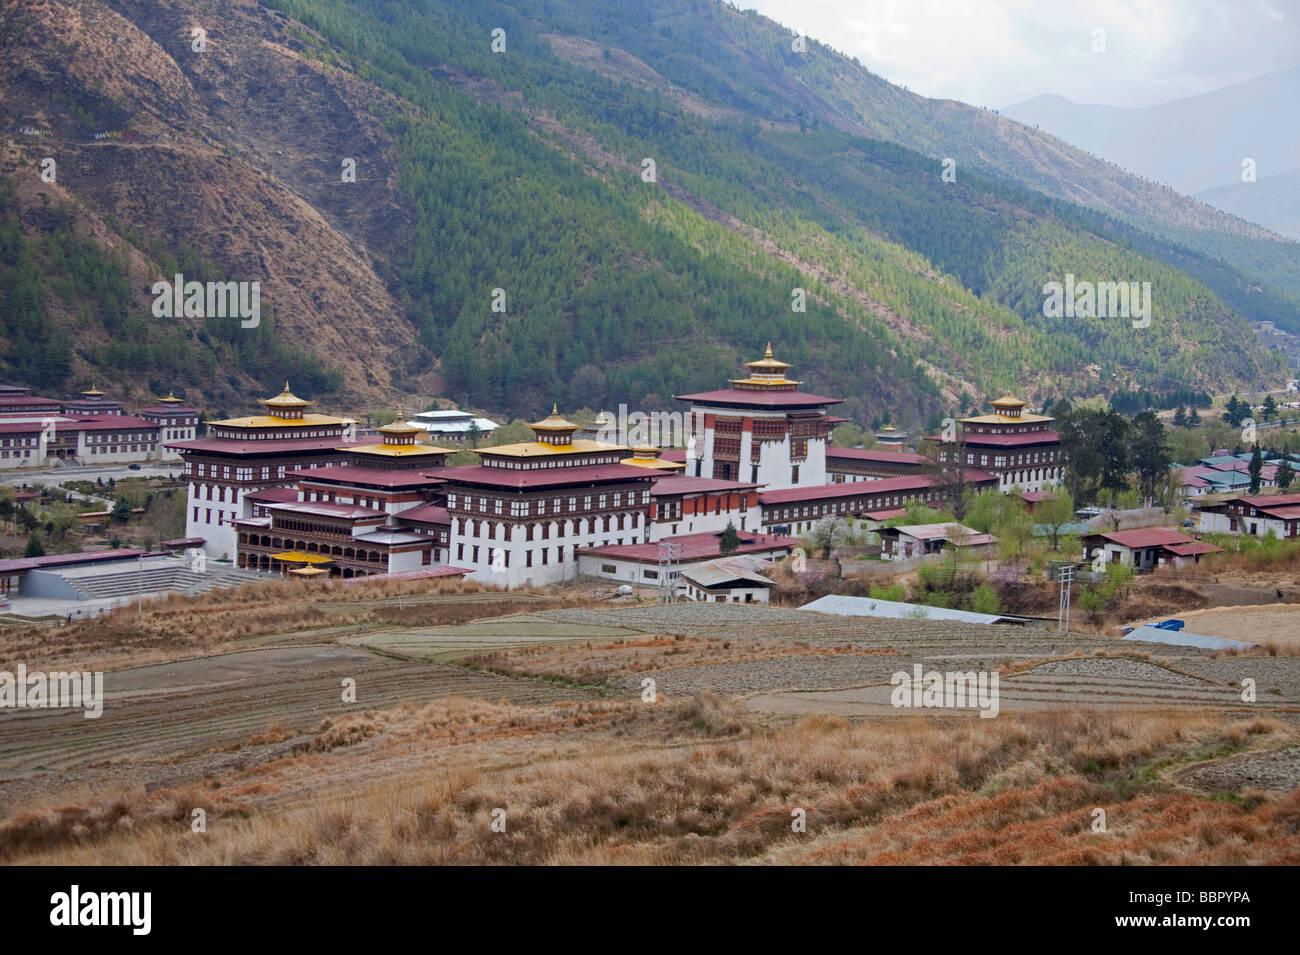 Palais Royal du Roi du Bhoutan building Tashi Chho Dzong Thimphu 91119_Bhutan-Thimphu Photo Stock